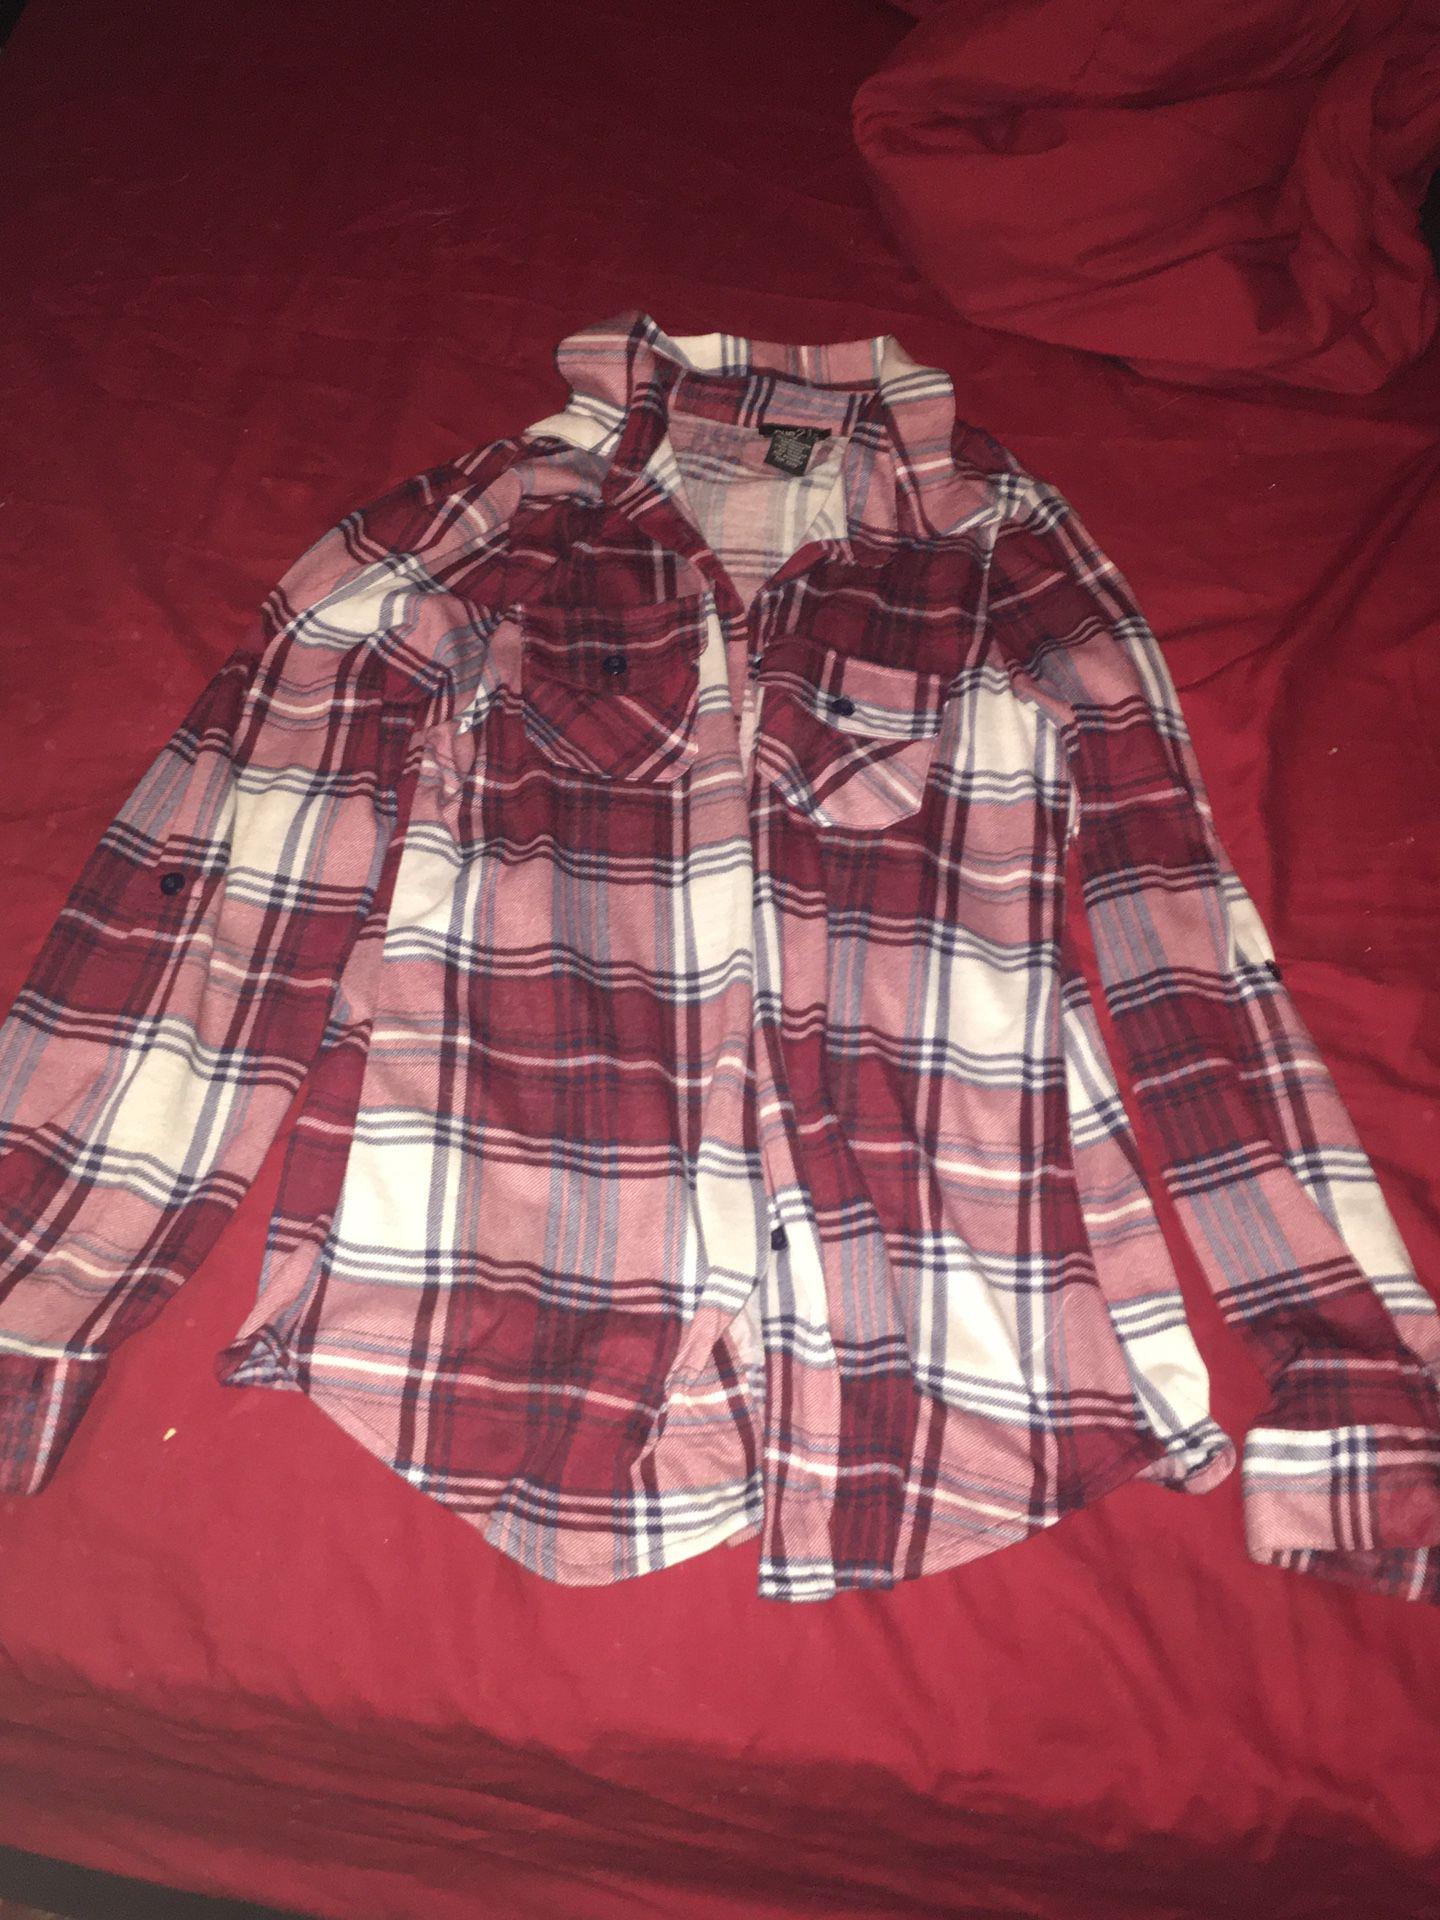 Ladies red and white plaid shirt. Size medium